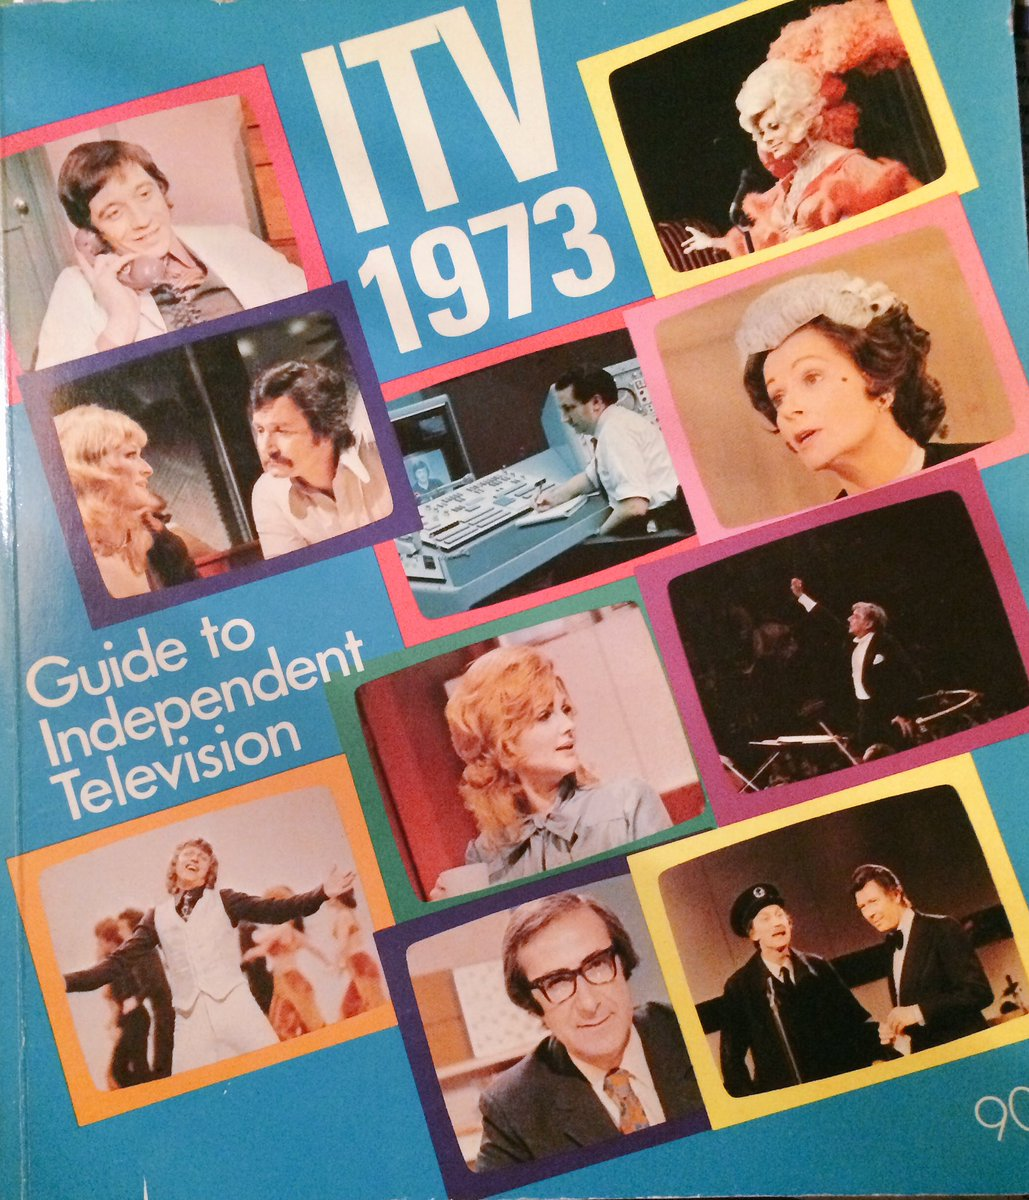 claus grimm on twitter itv yearbook 1973 iba mediahistorynow